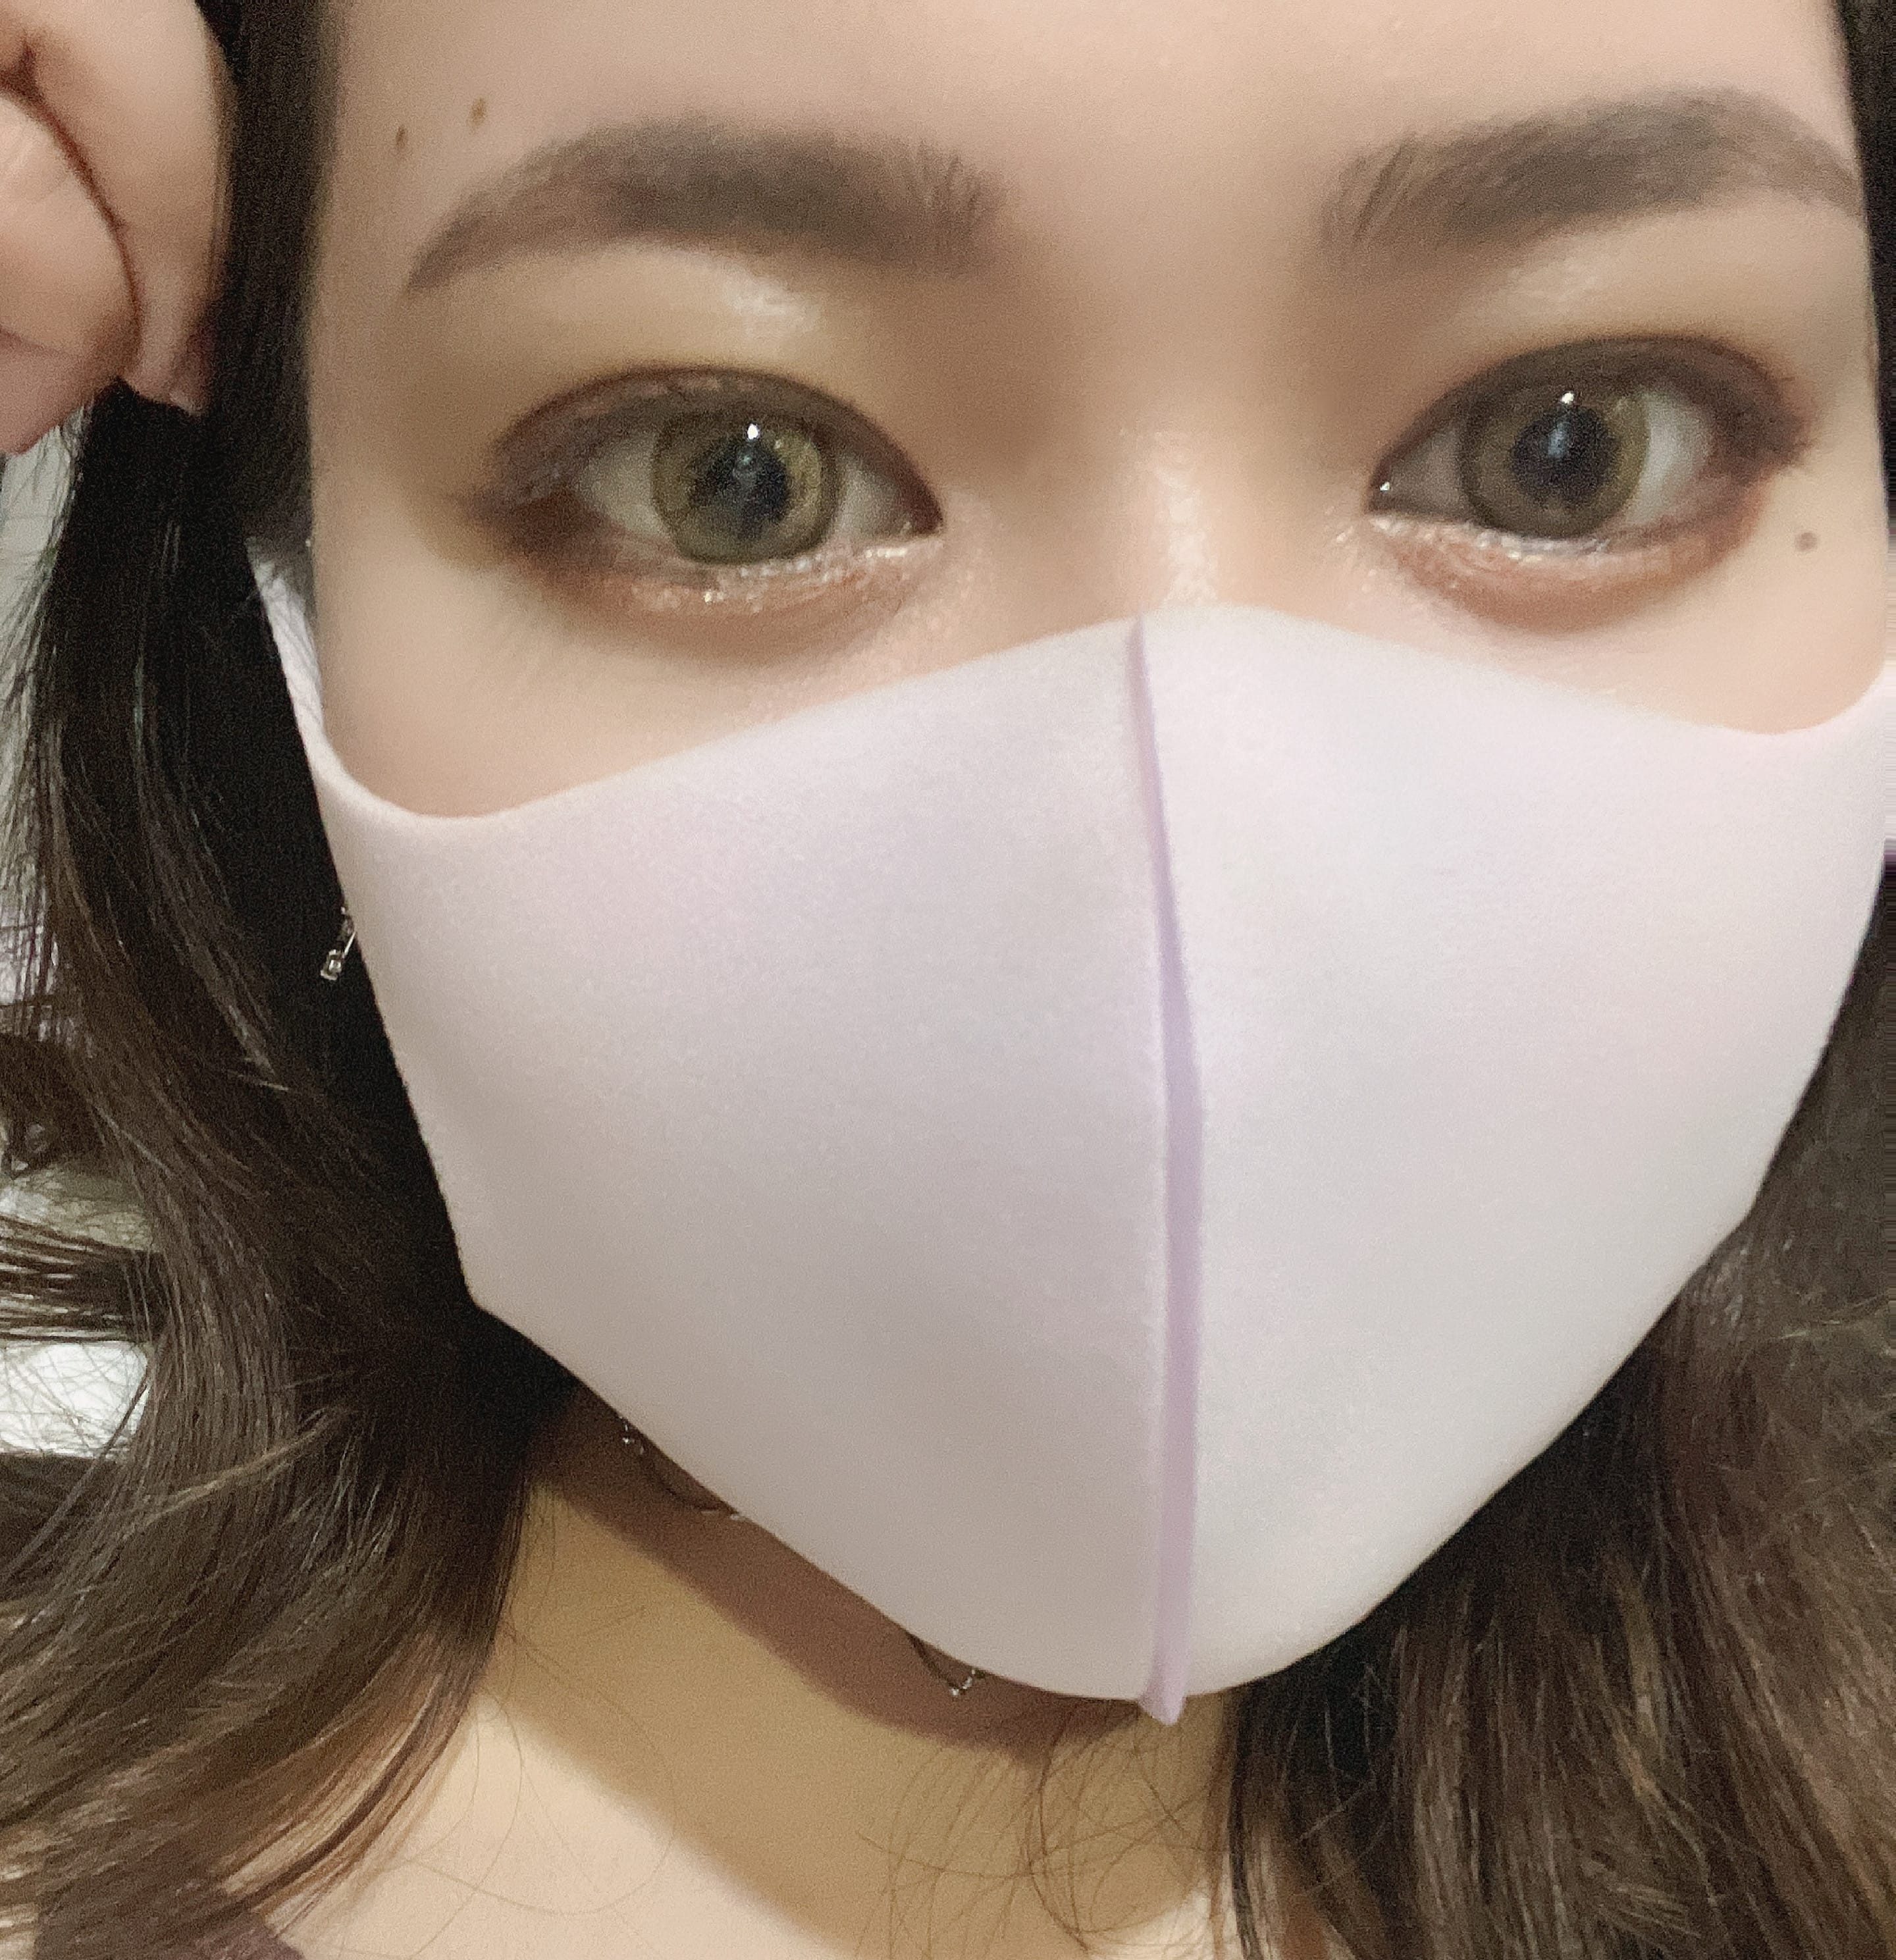 「美容DAY♡」06/17(木) 12:21 | 新名桃の写メ日記